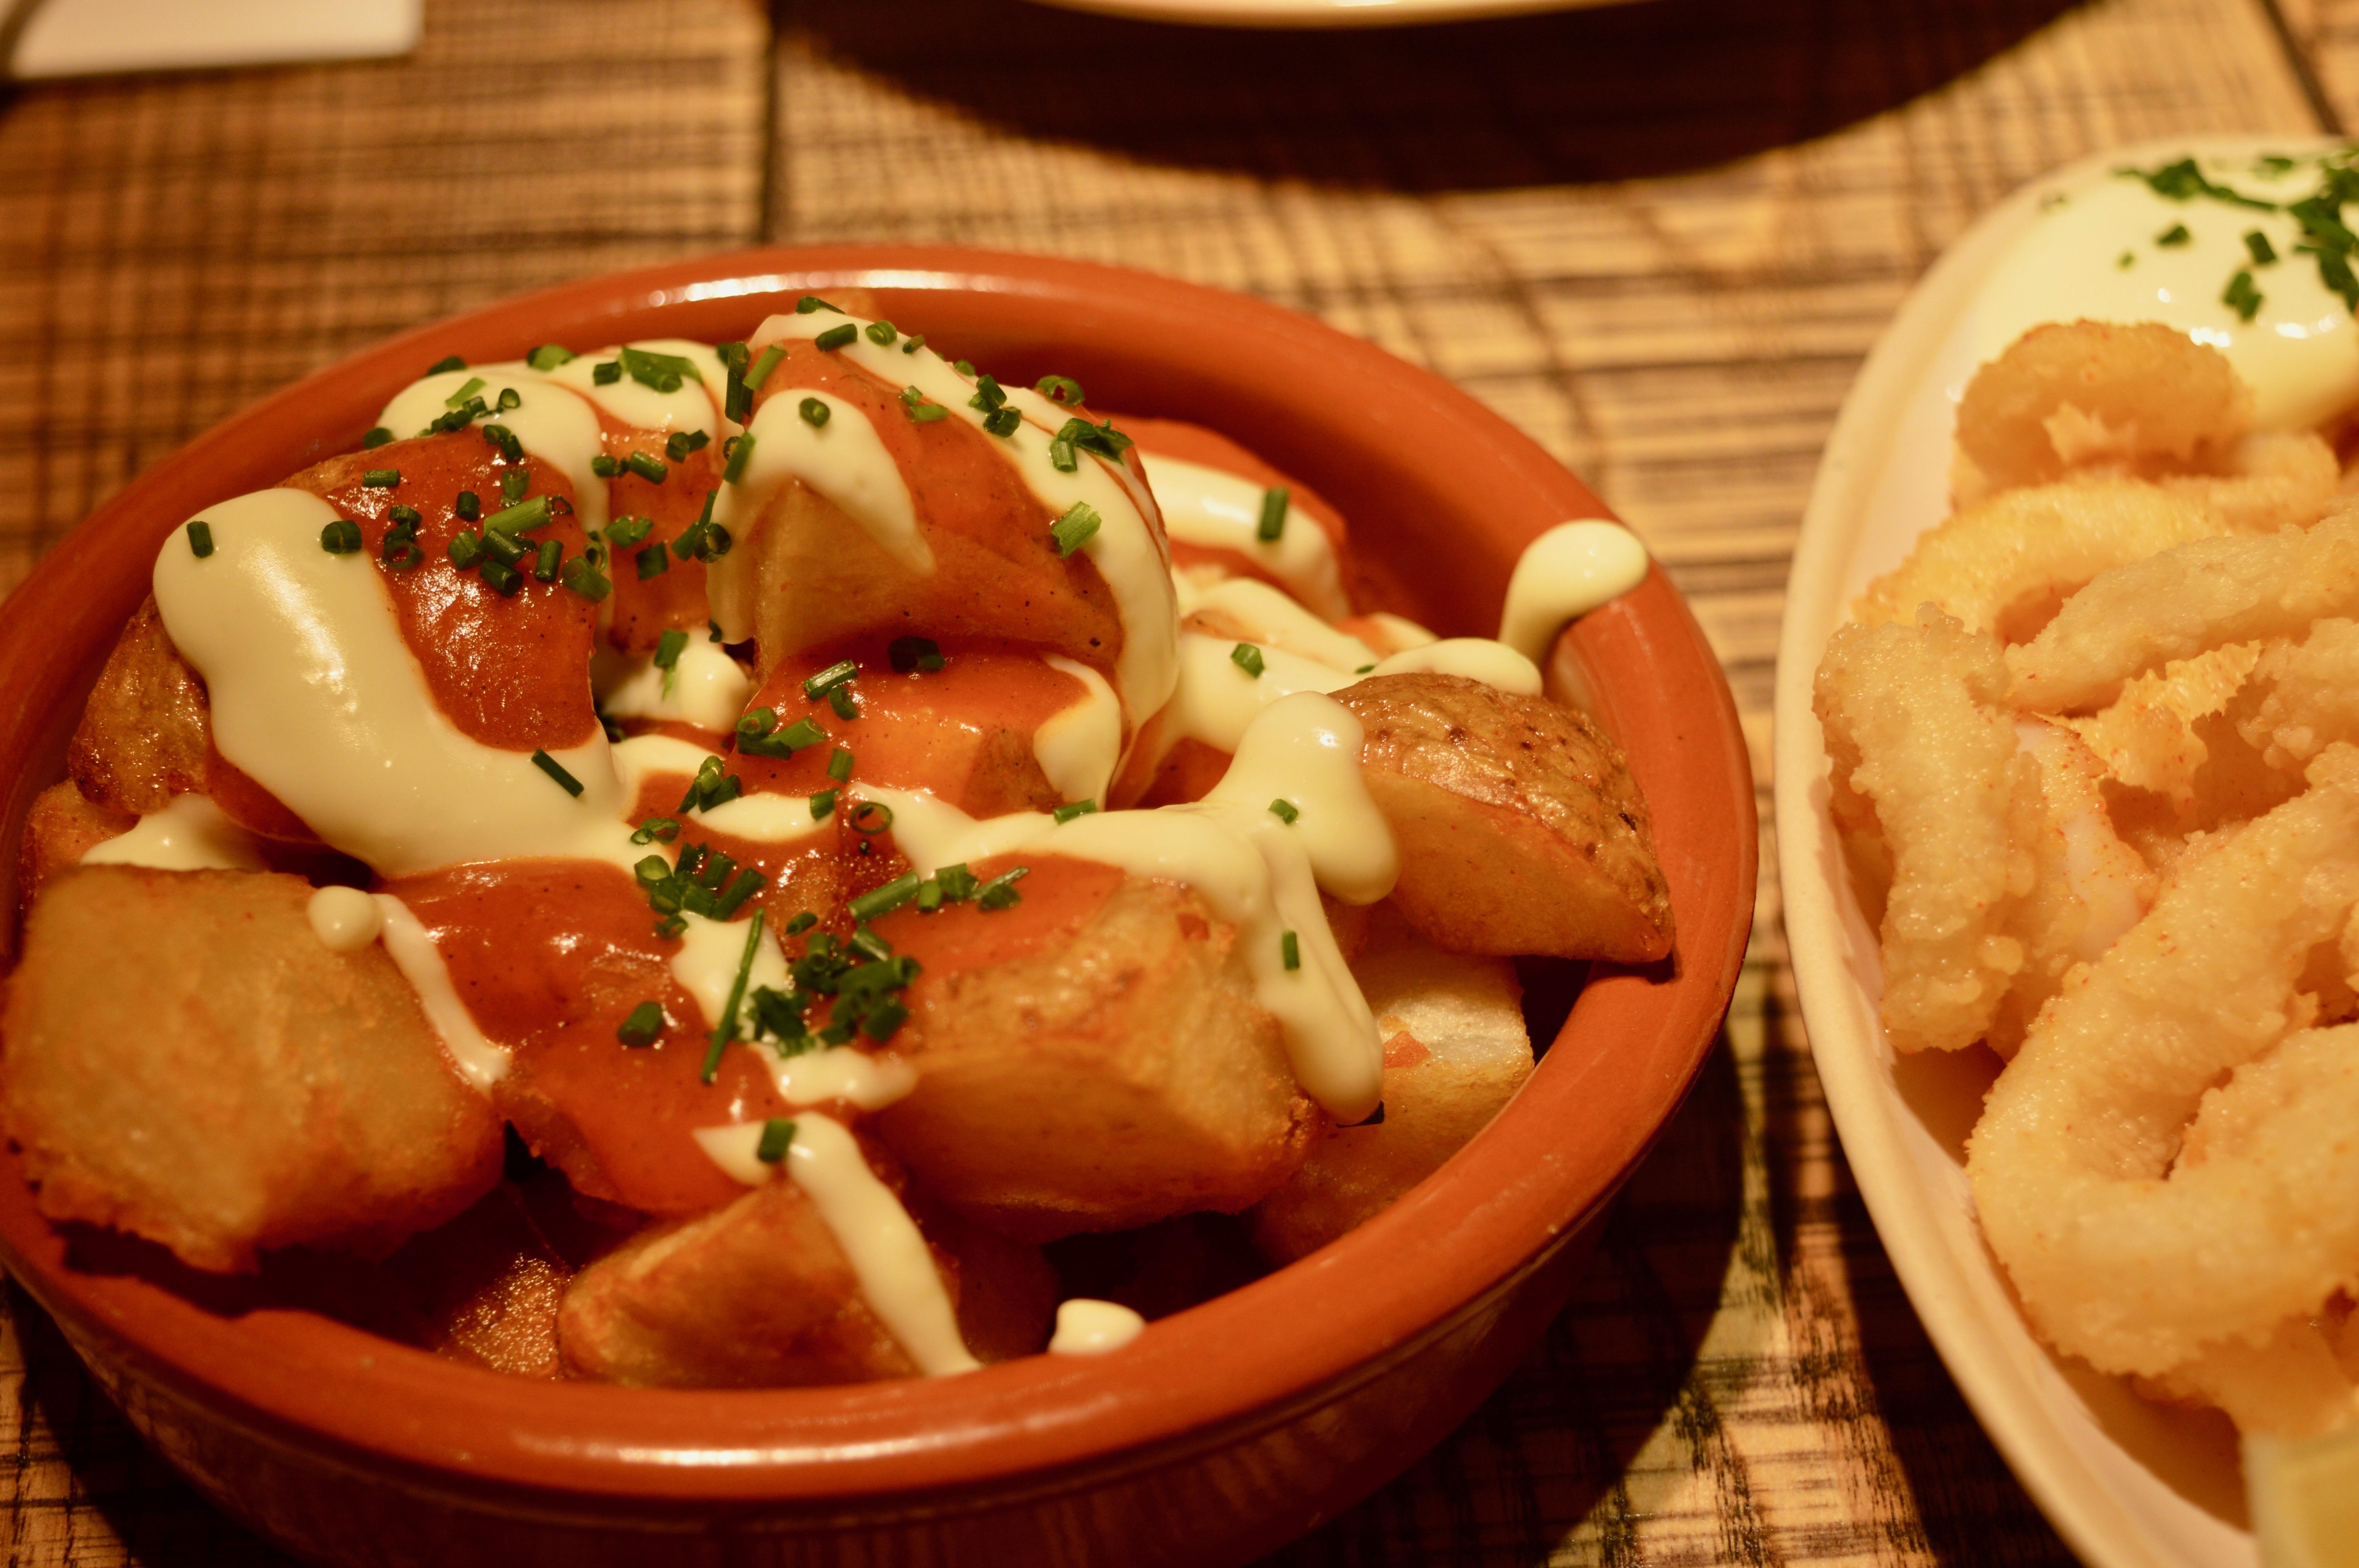 potatas-bravas-tapas-revolution-food-review-newcastle-omar-allibhoy-elle-blonde-luxury-lifestyle-destination-blog